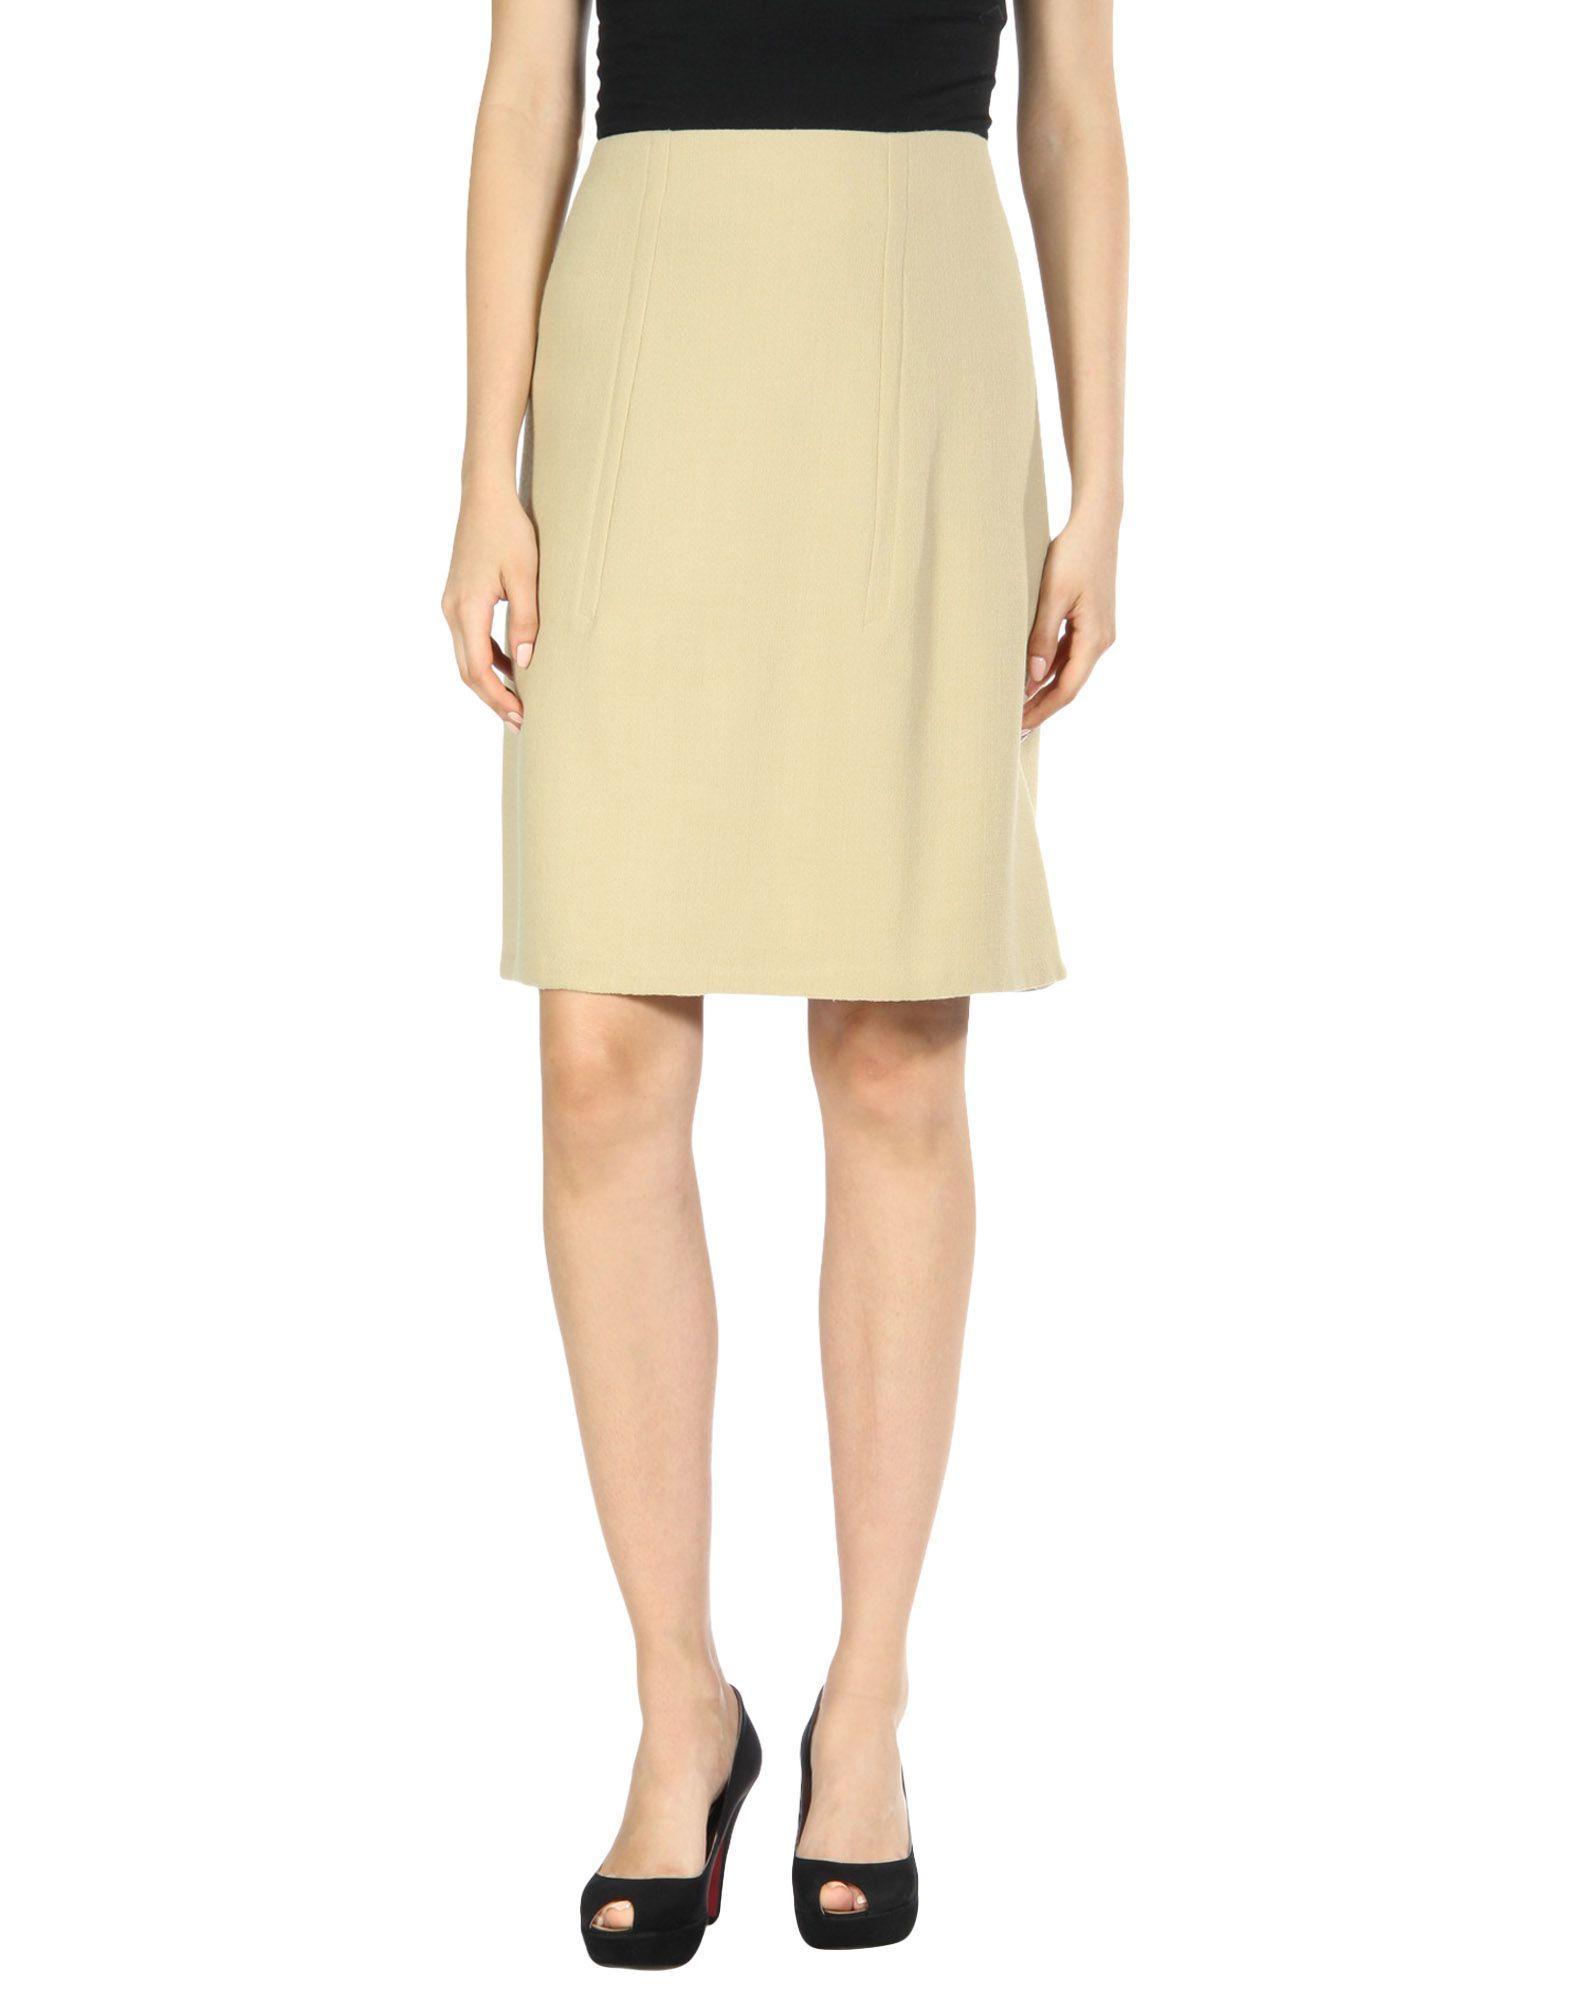 VERONIQUE LEROY Knee Length Skirts in Beige